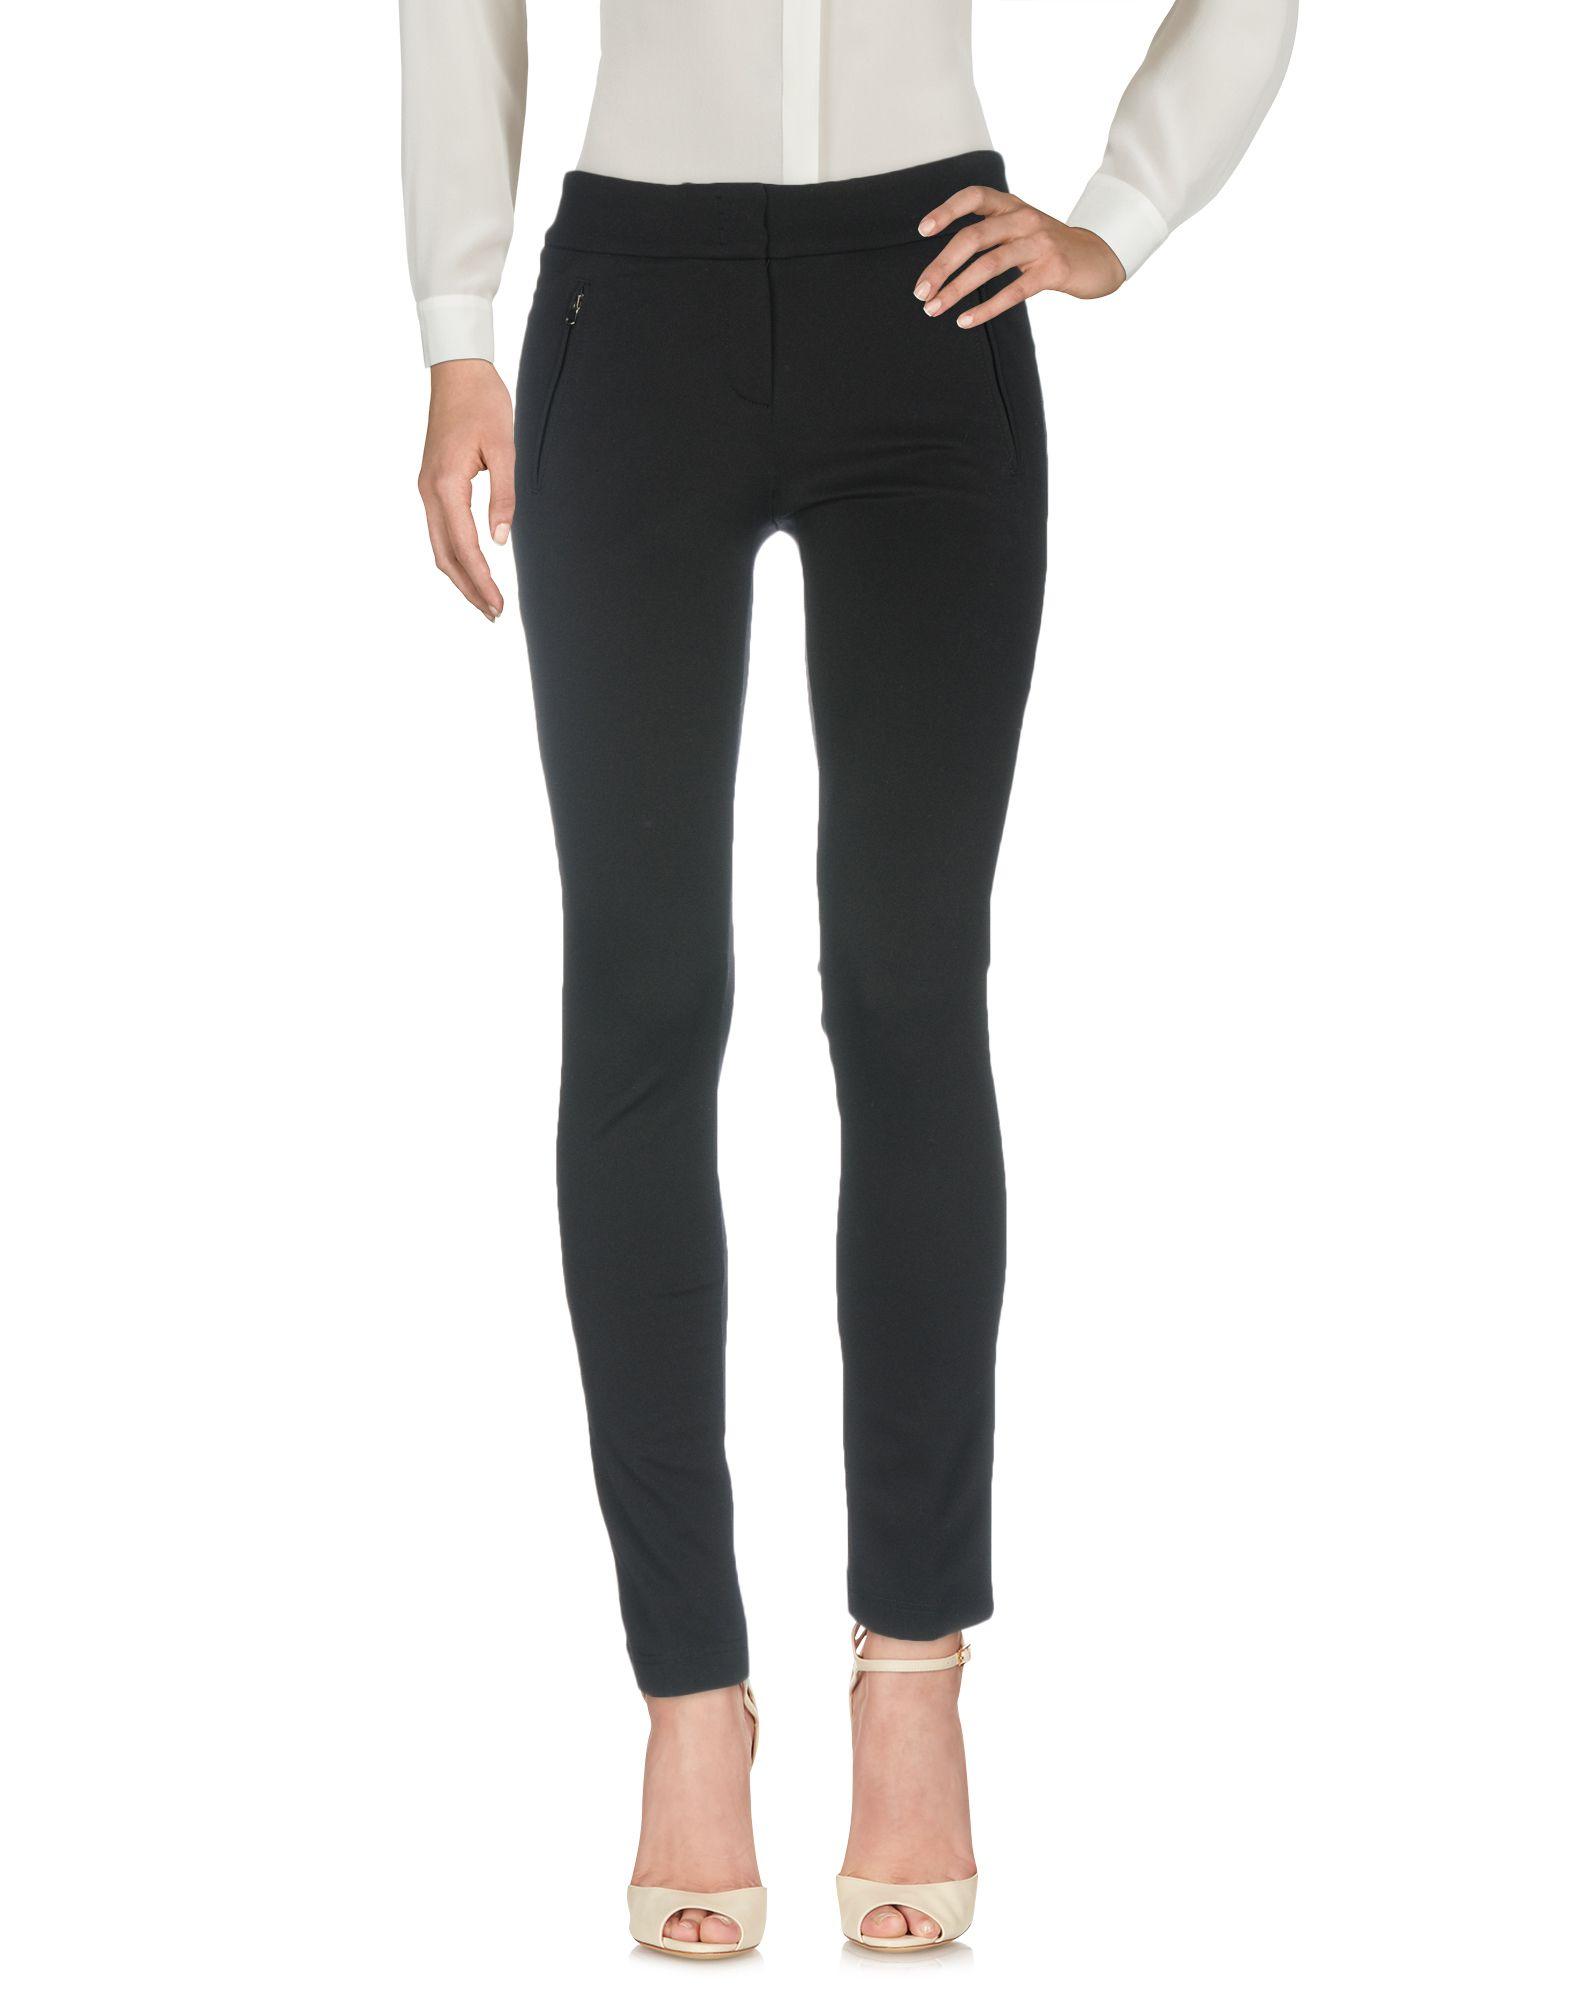 Pantalone Peserico Sign Donna - Acquista online su 3nZItszEz